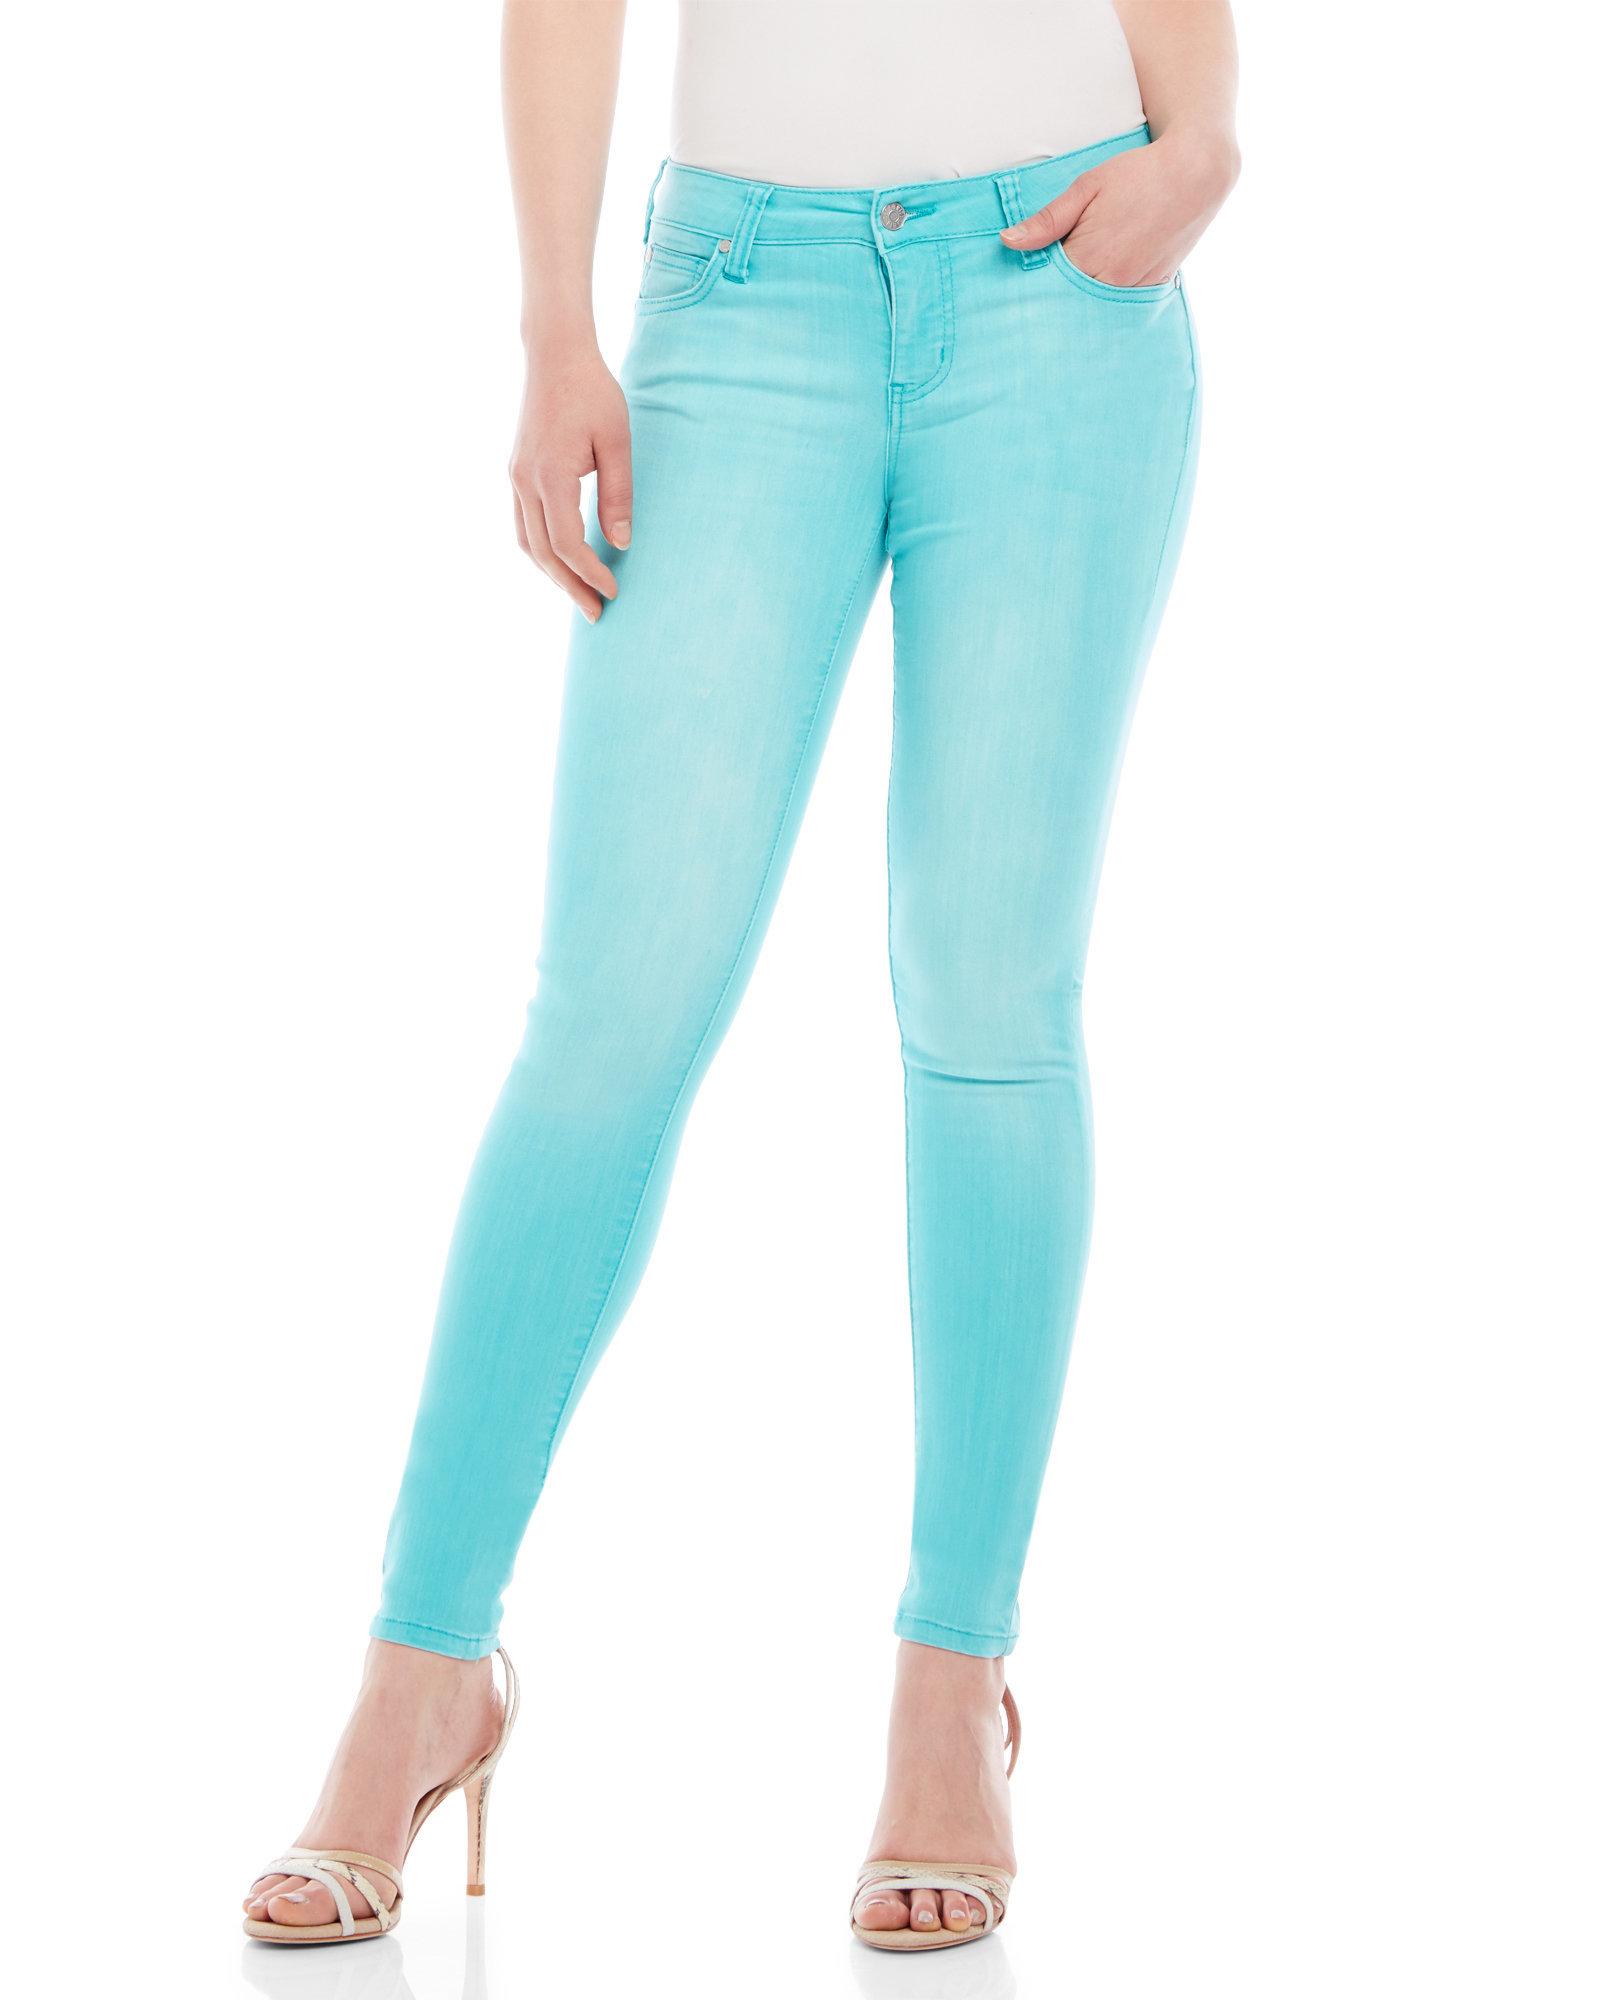 Amazon.com: celebrity pink jeans skinny